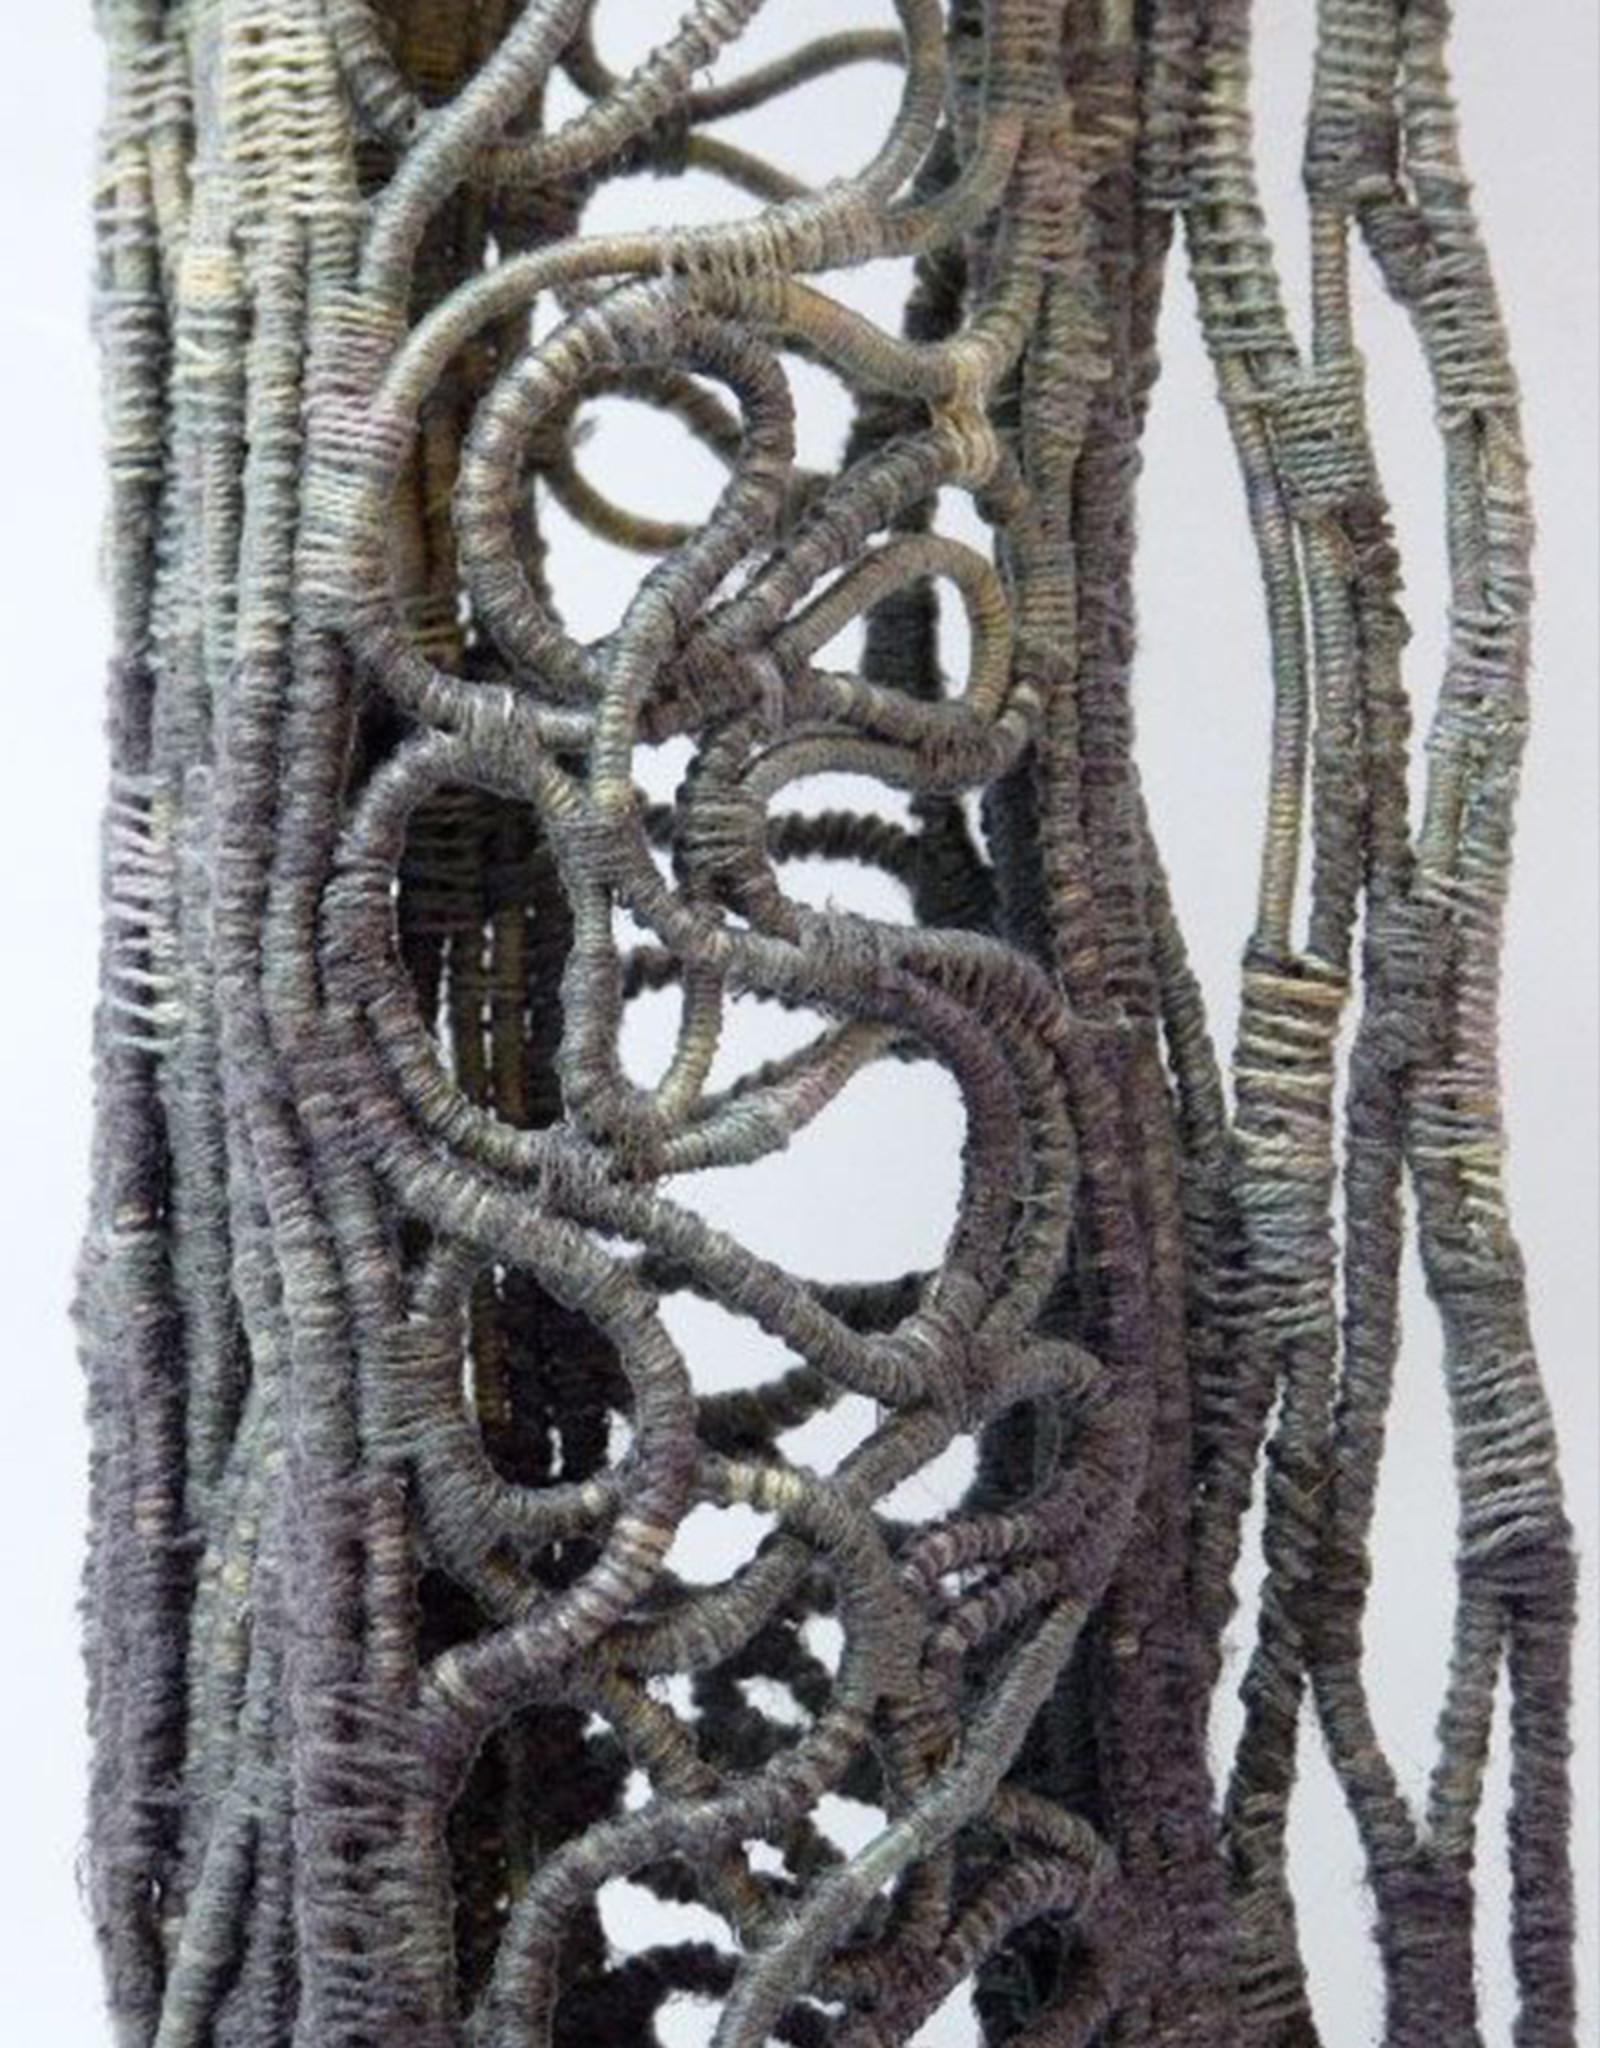 Stitch and Structure / Jean Draper